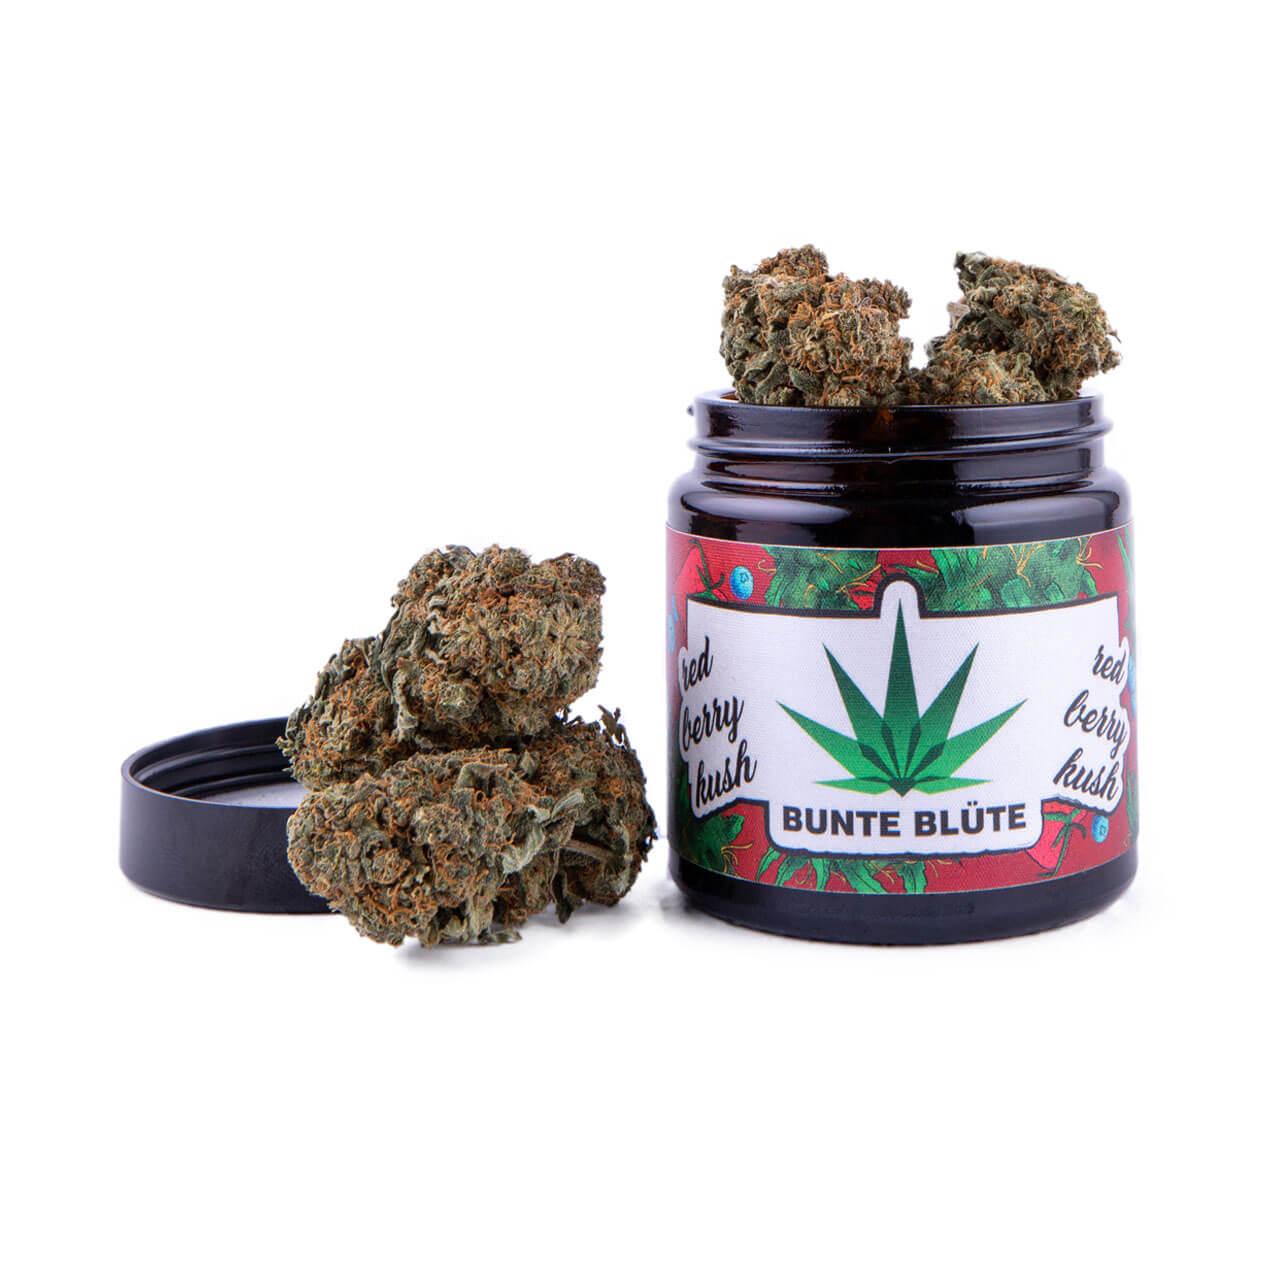 bunte-bluete-cbd-cannabis-red-berry-kush-glas-knolle-buds-5gramm